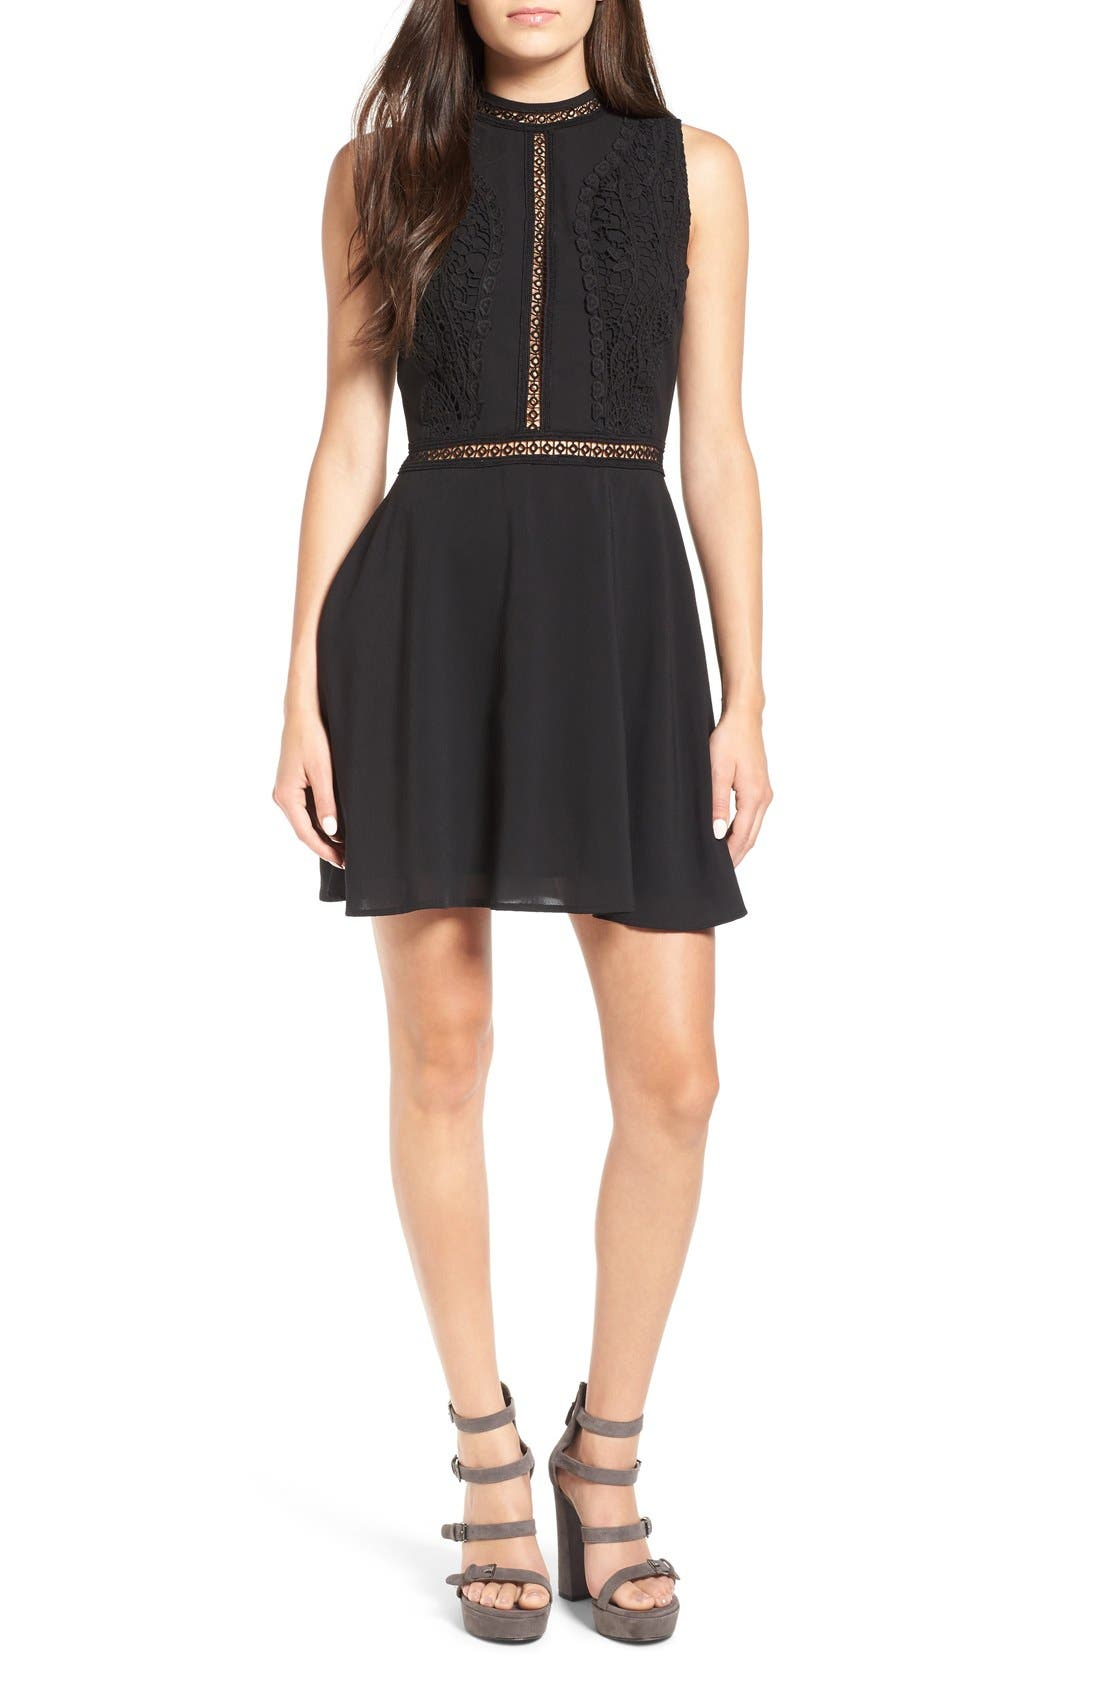 Main Image - Storee Crochet Lace Fit & Flare Dress